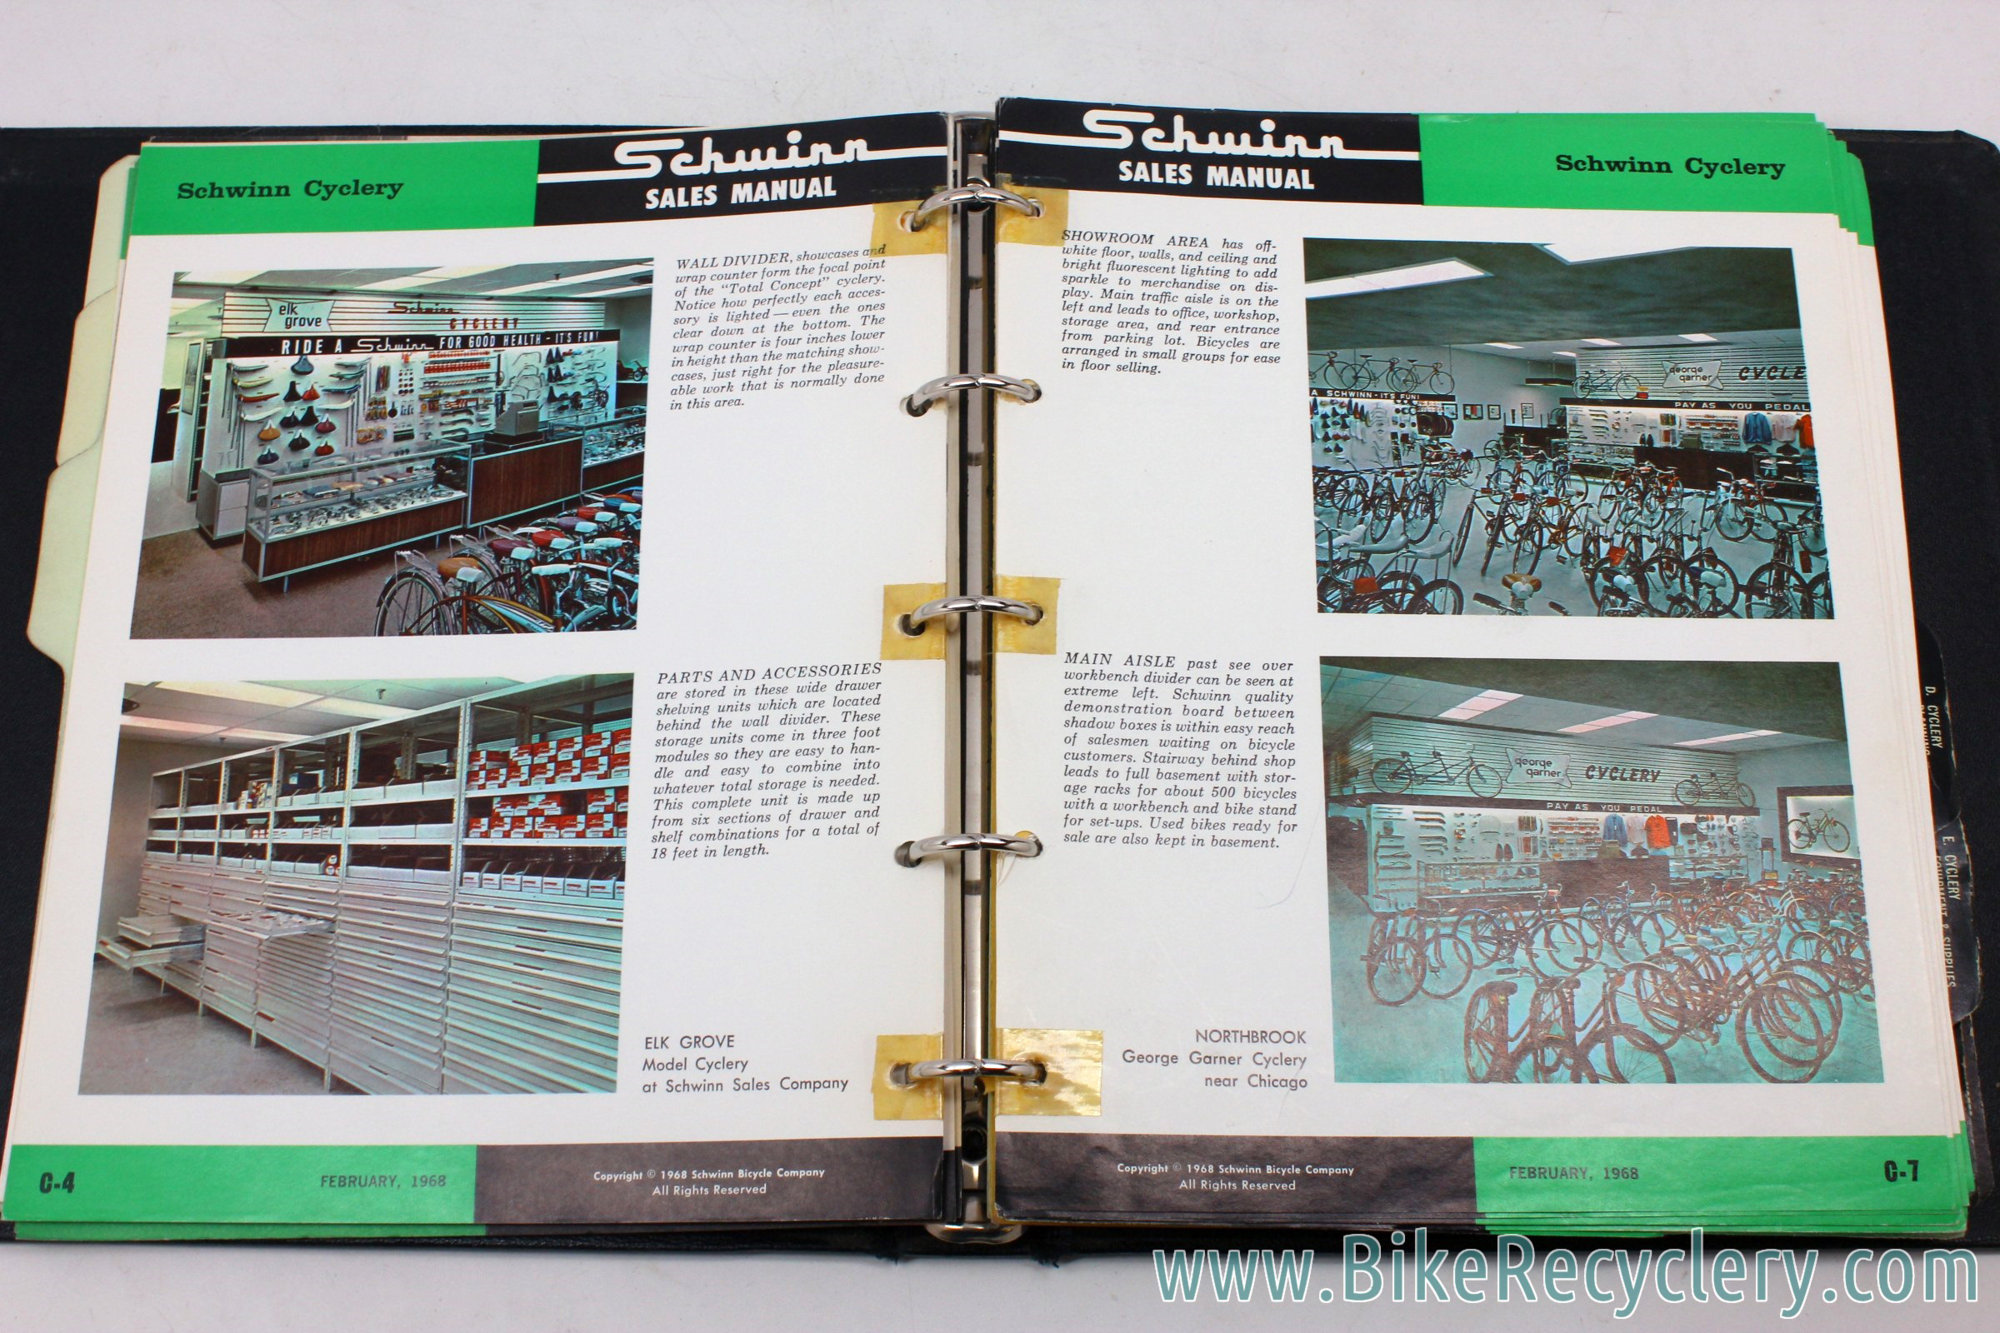 vintage_schwinn_memorabilia_catalogs_dealer_service_manuals_17820.JPG